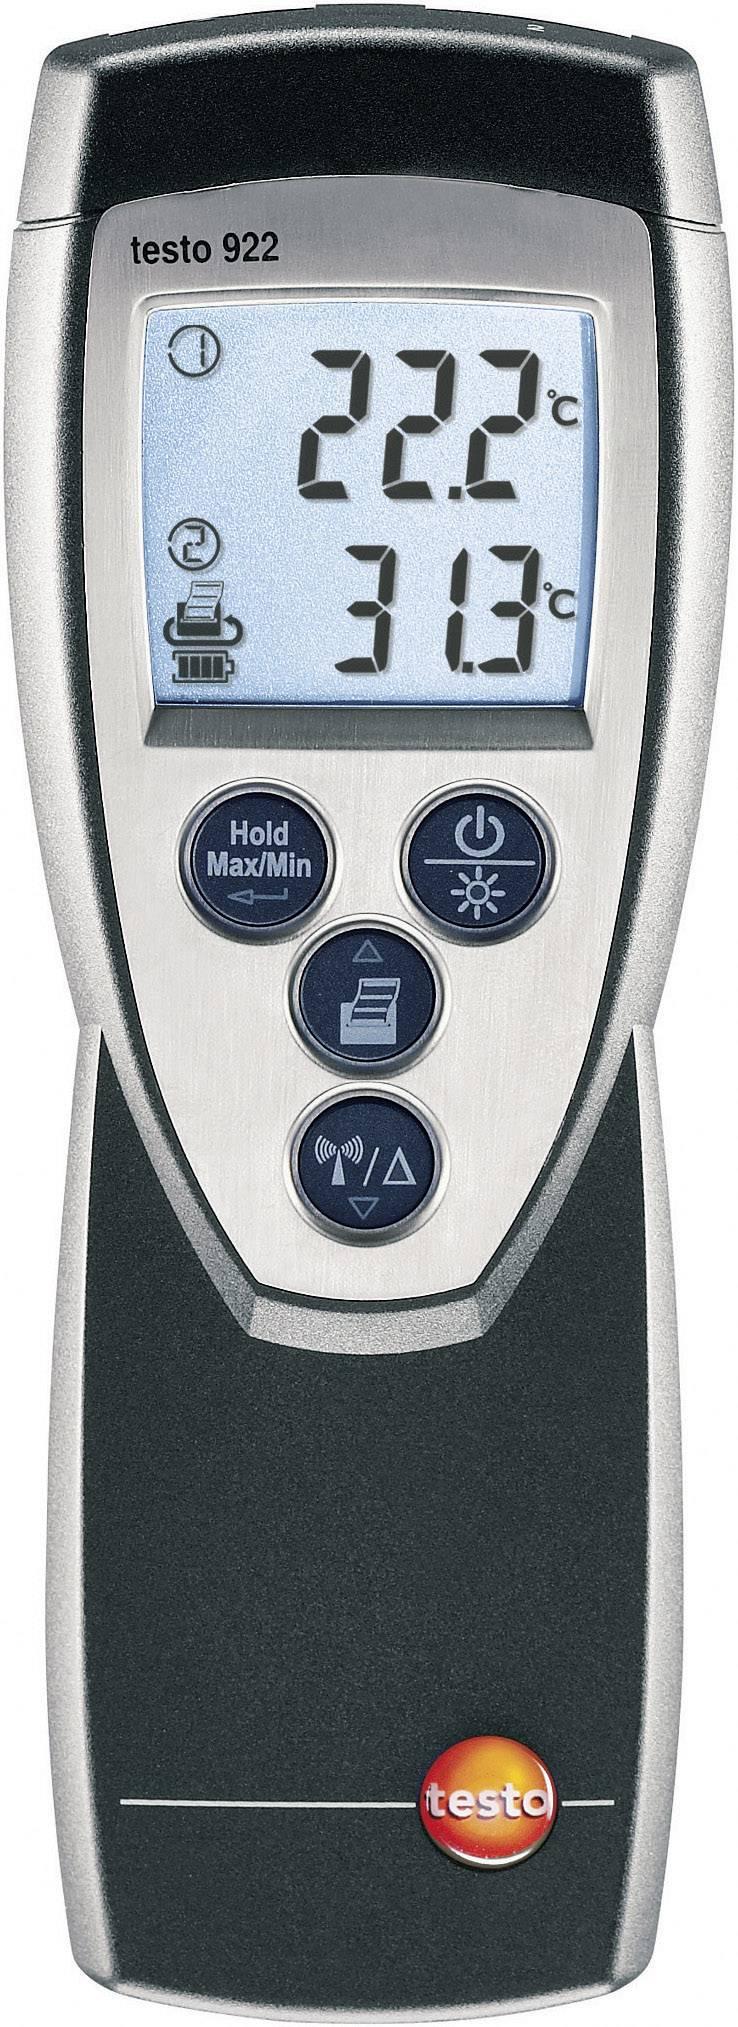 Teplomer testo 922, -50 až +1000 °C, typ K